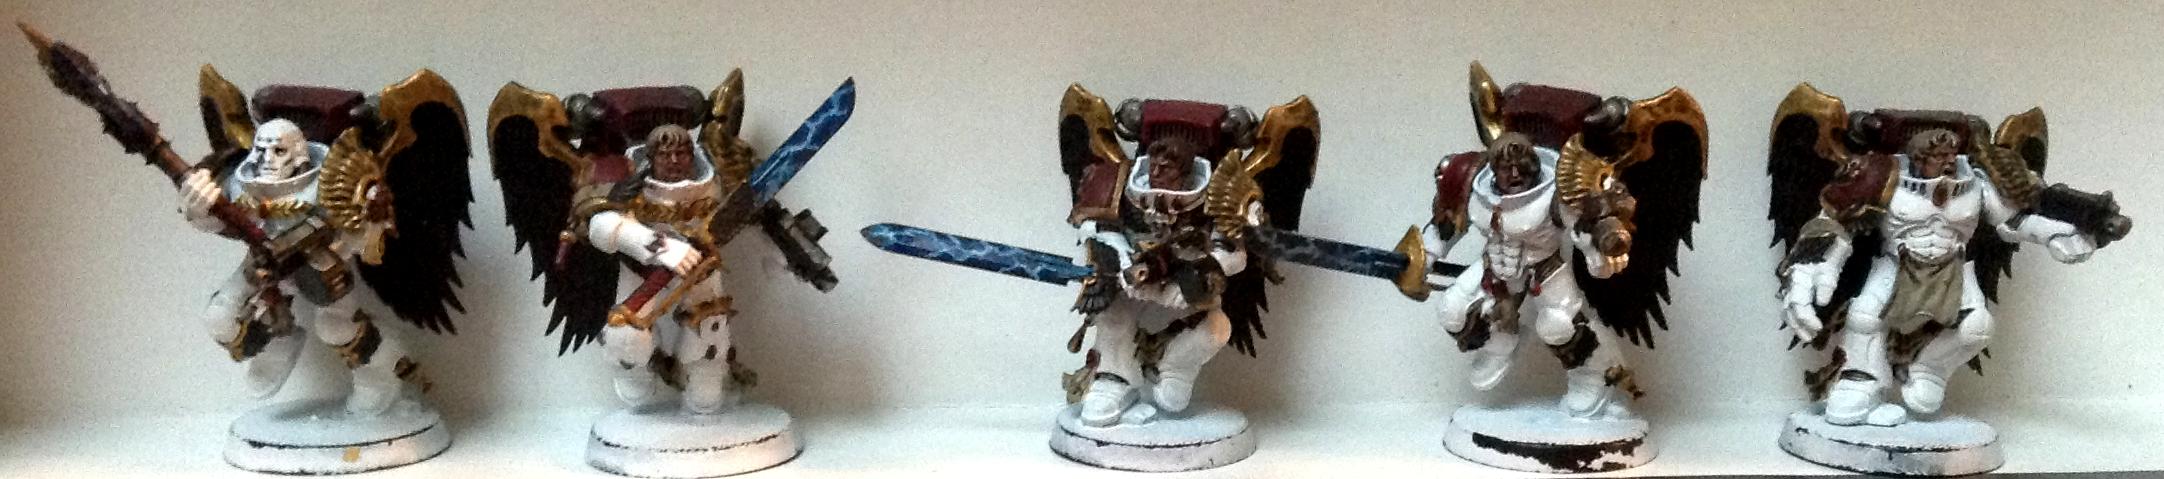 Angels Encarmine, Blood Angels, Sanguinary Guard, Warhammer 40,000